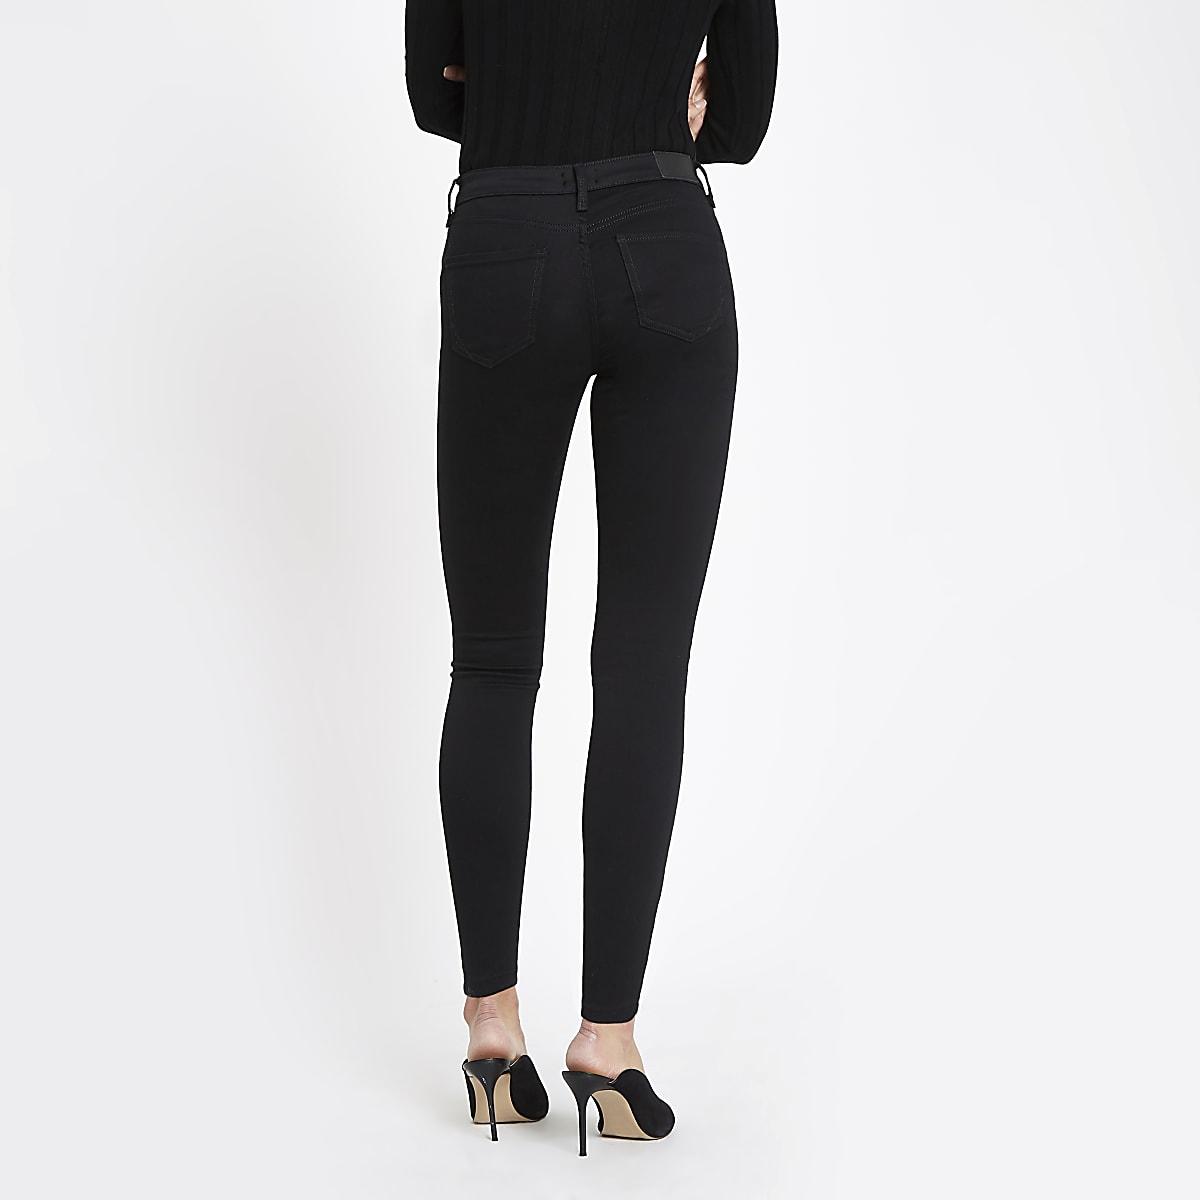 e6d559cd53 Black Amelie super skinny jeans - Skinny Jeans - Jeans - women